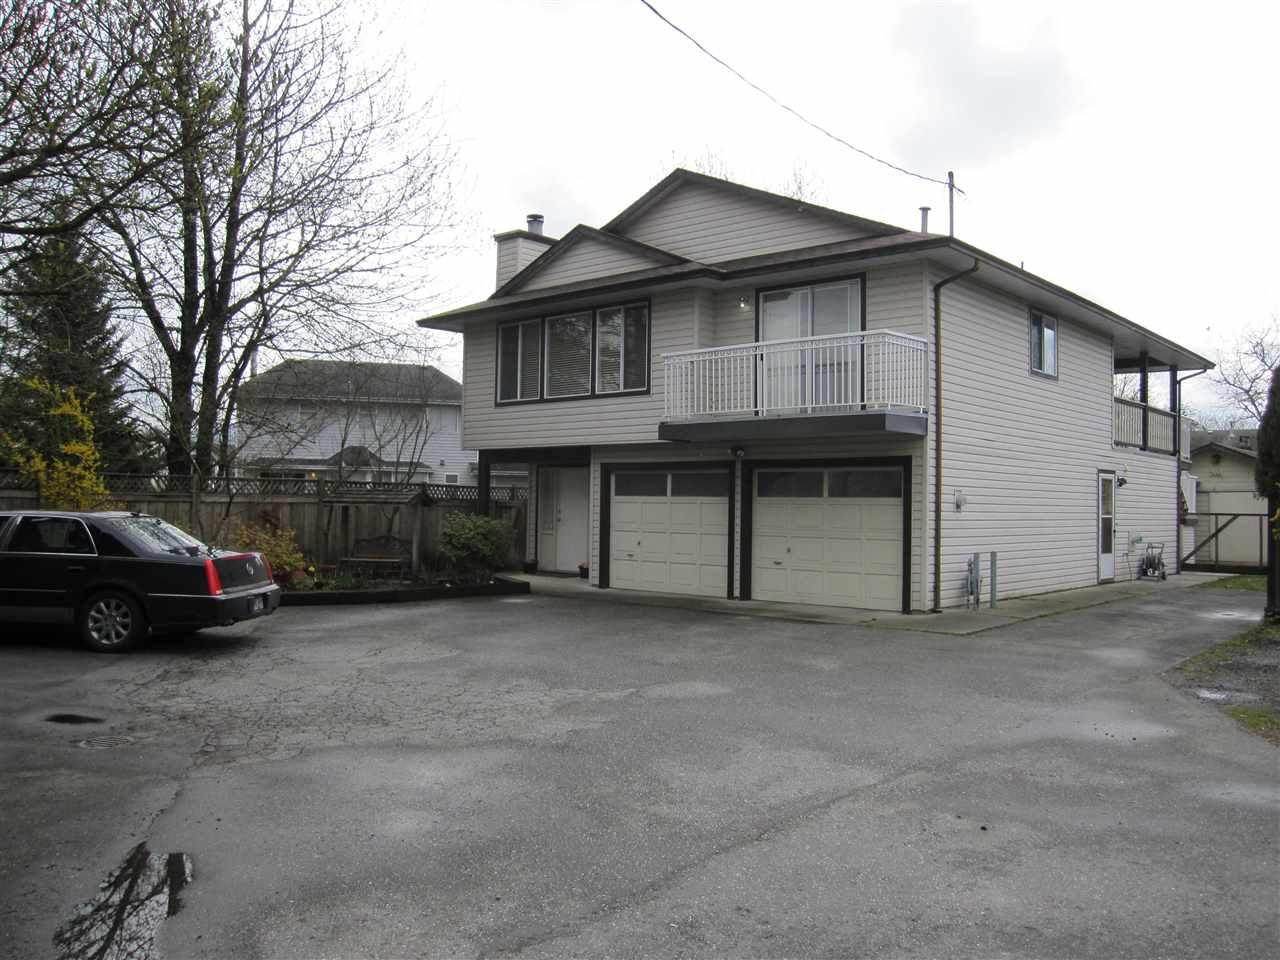 Main Photo: 23444 DEWDNEY TRUNK Road in Maple Ridge: Cottonwood MR House for sale : MLS®# R2048819